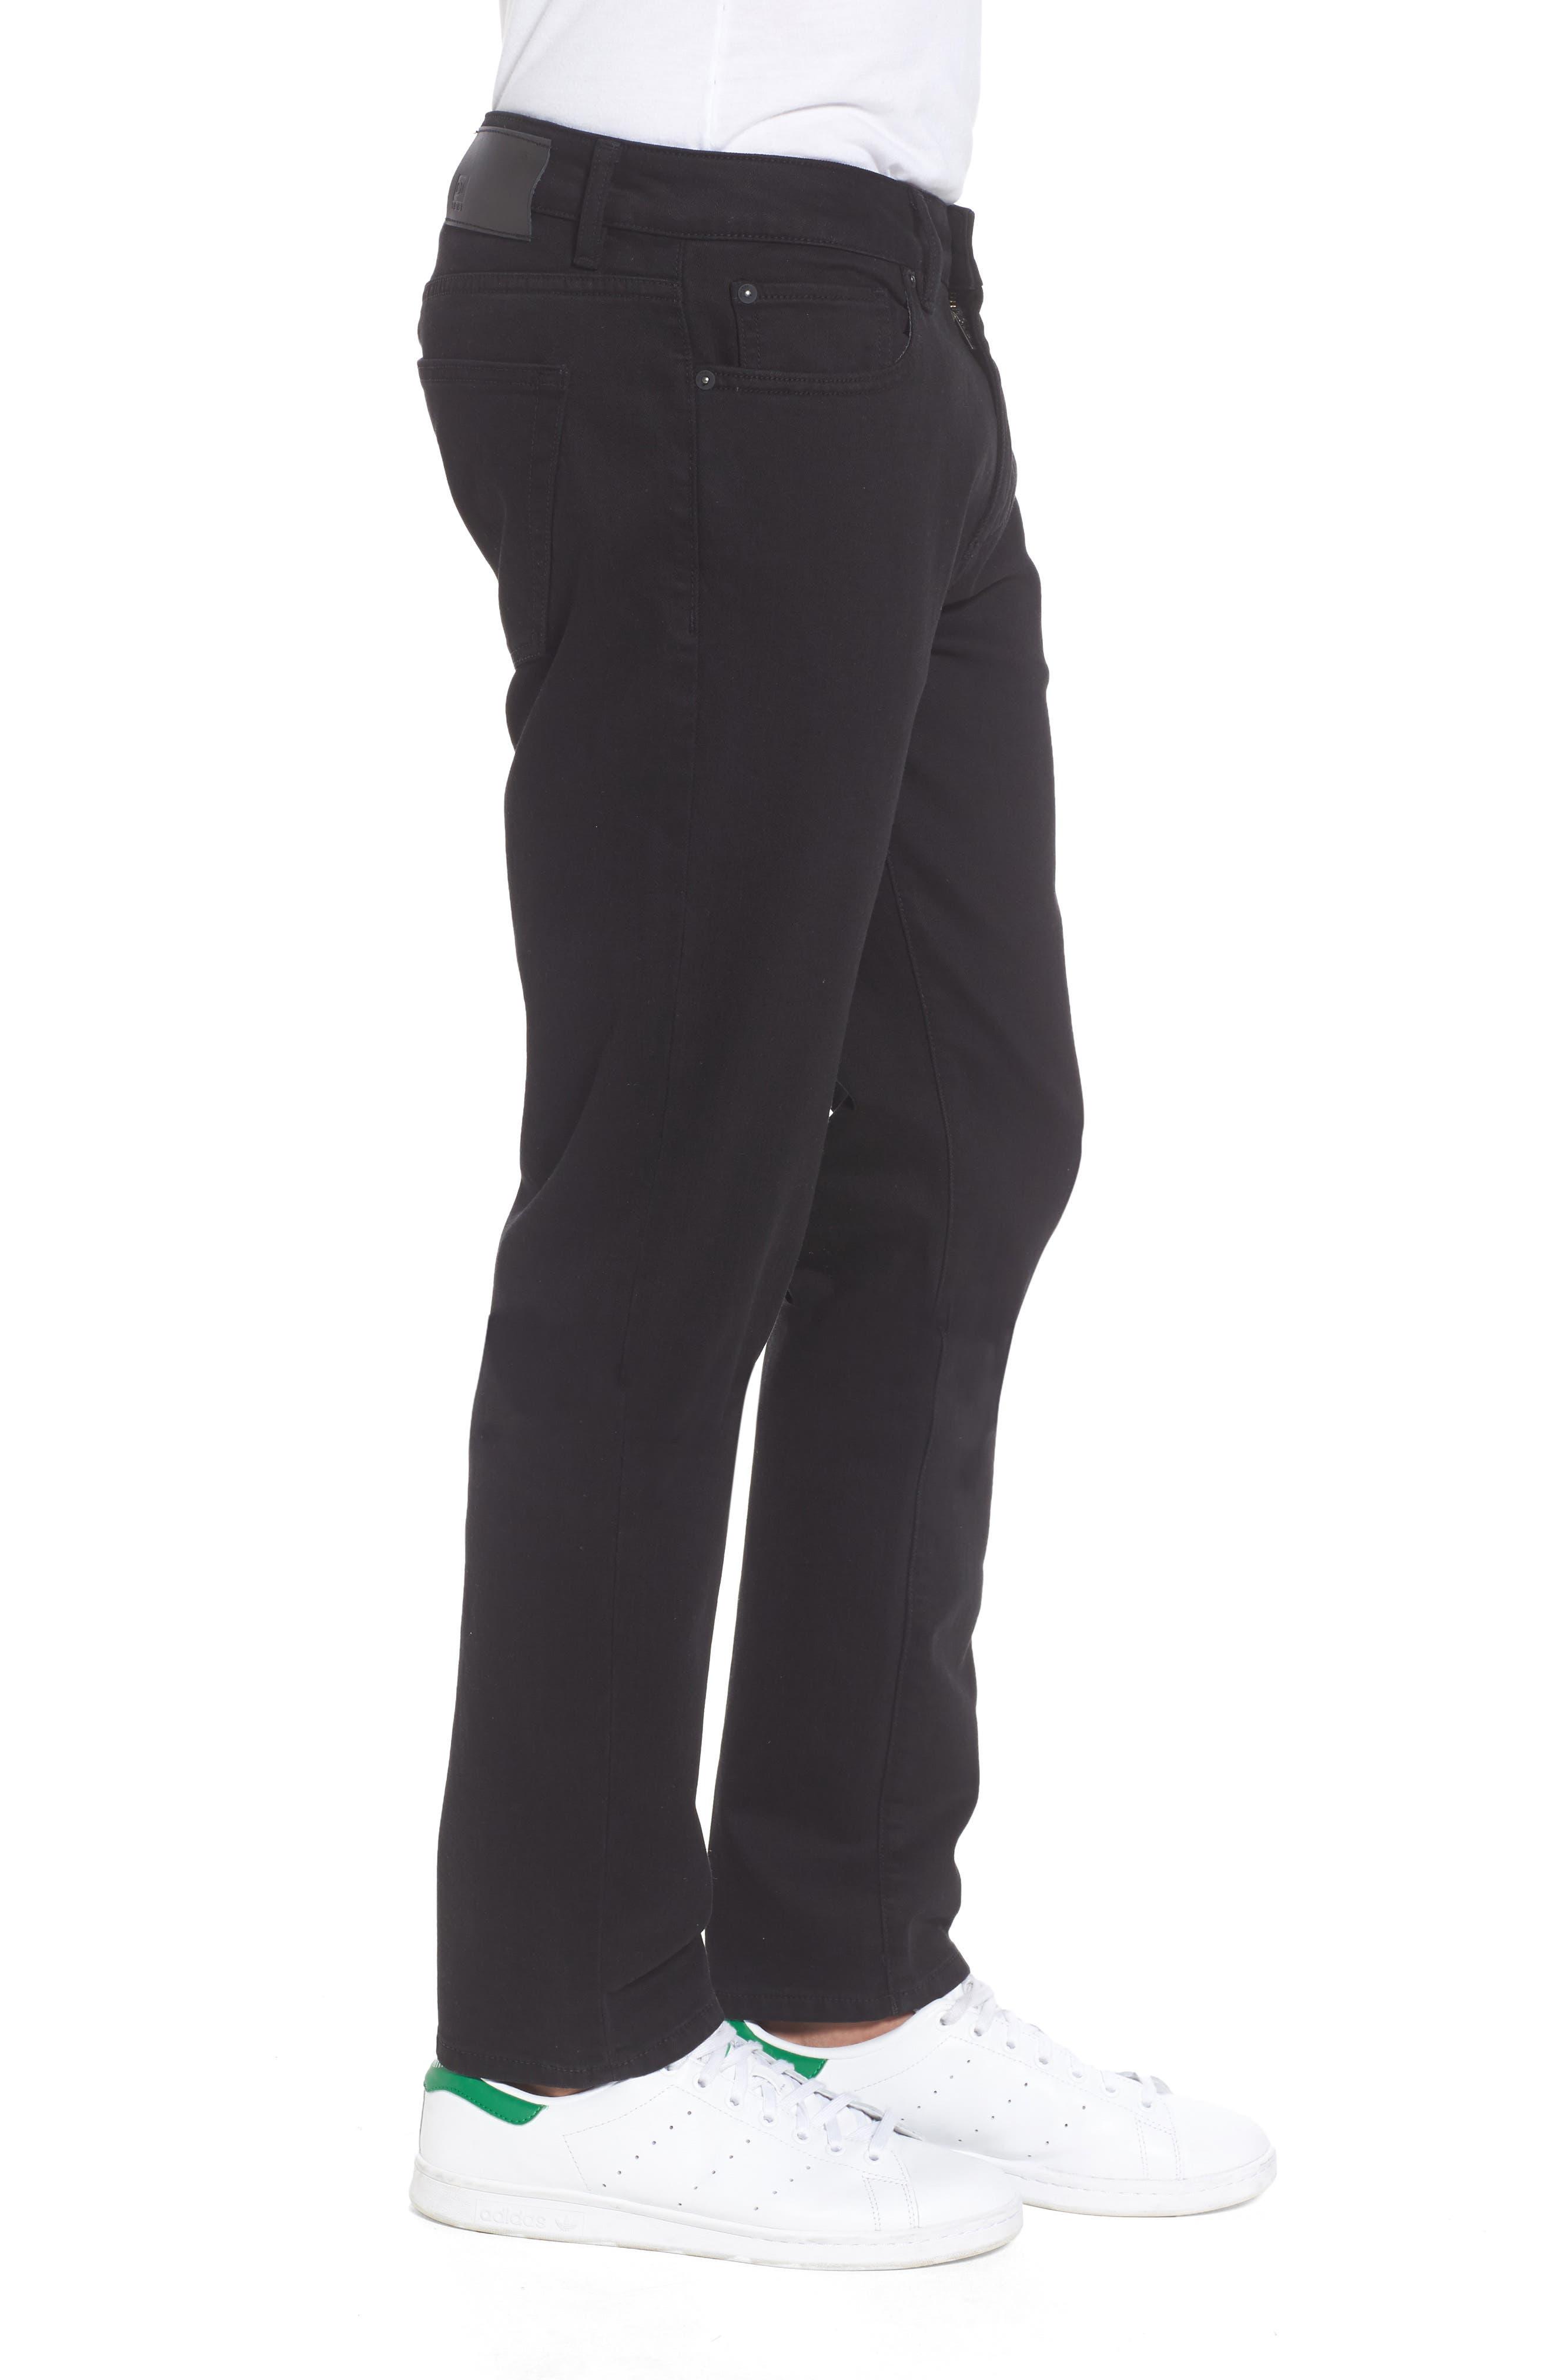 Nick Slim Fit Flat Front Pants,                             Alternate thumbnail 3, color,                             001